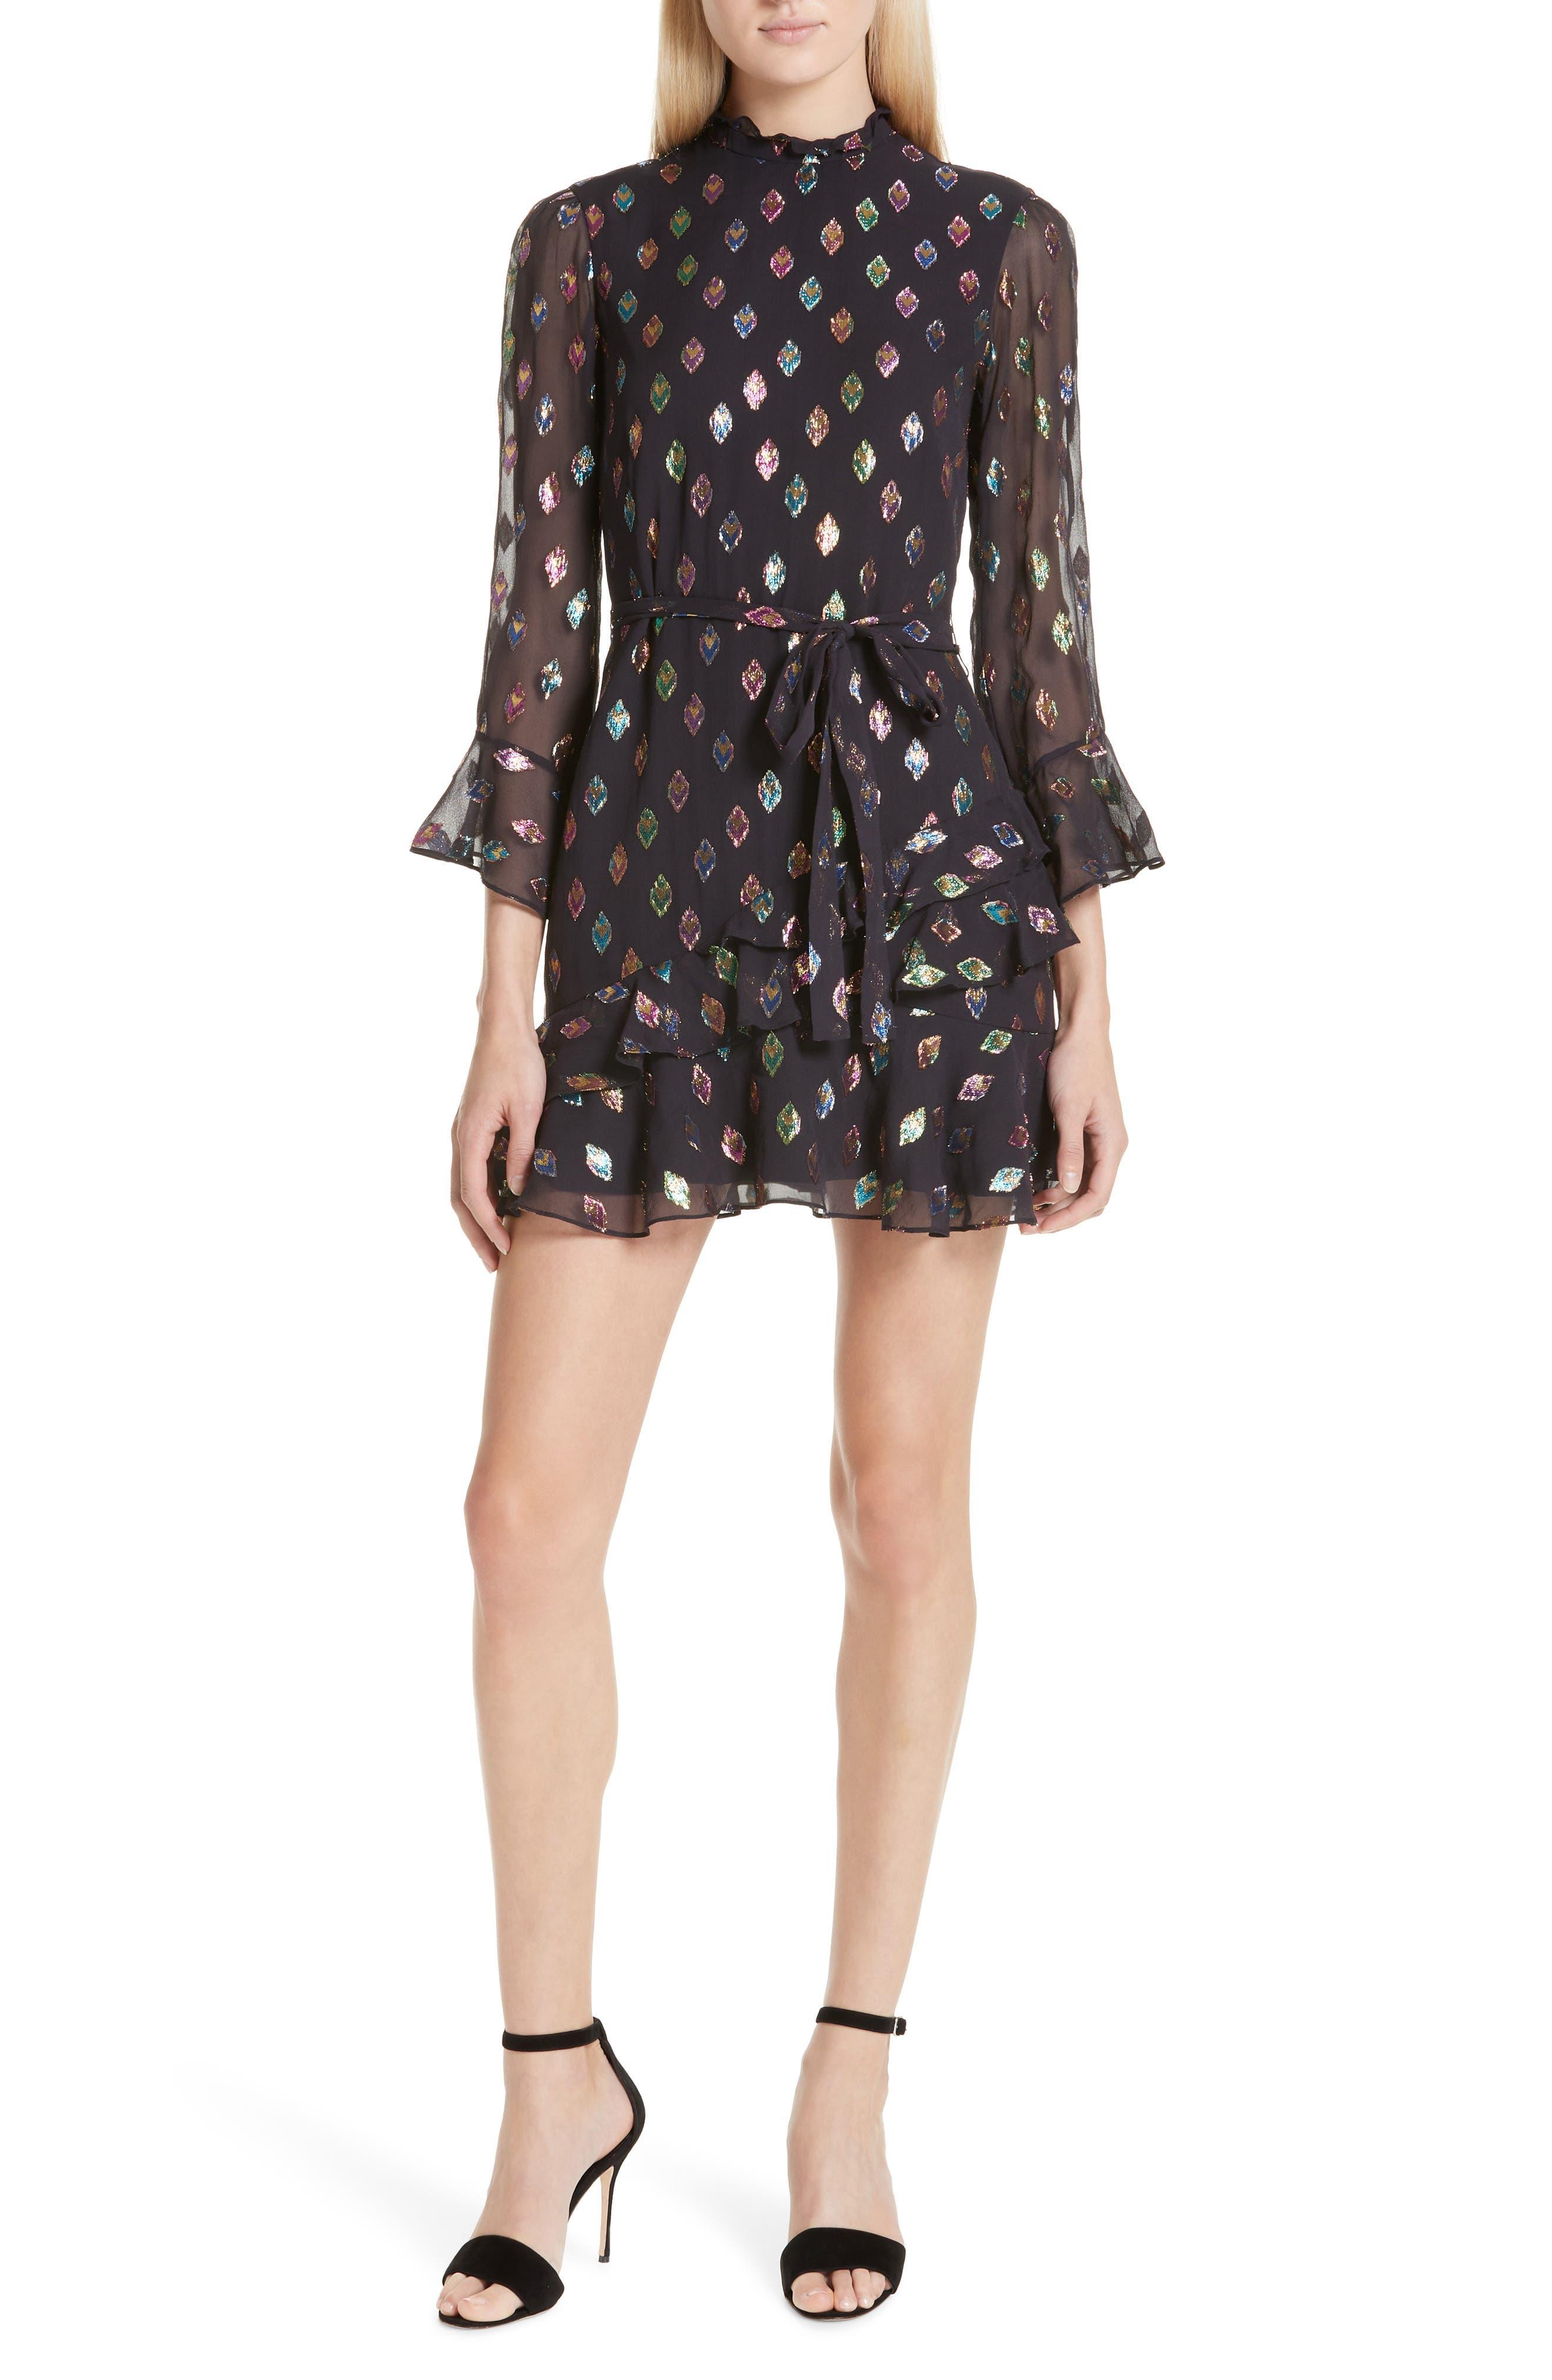 SALONI, Marissa Metallic Fil Coupé Silk Blend Minidress, Main thumbnail 1, color, 003